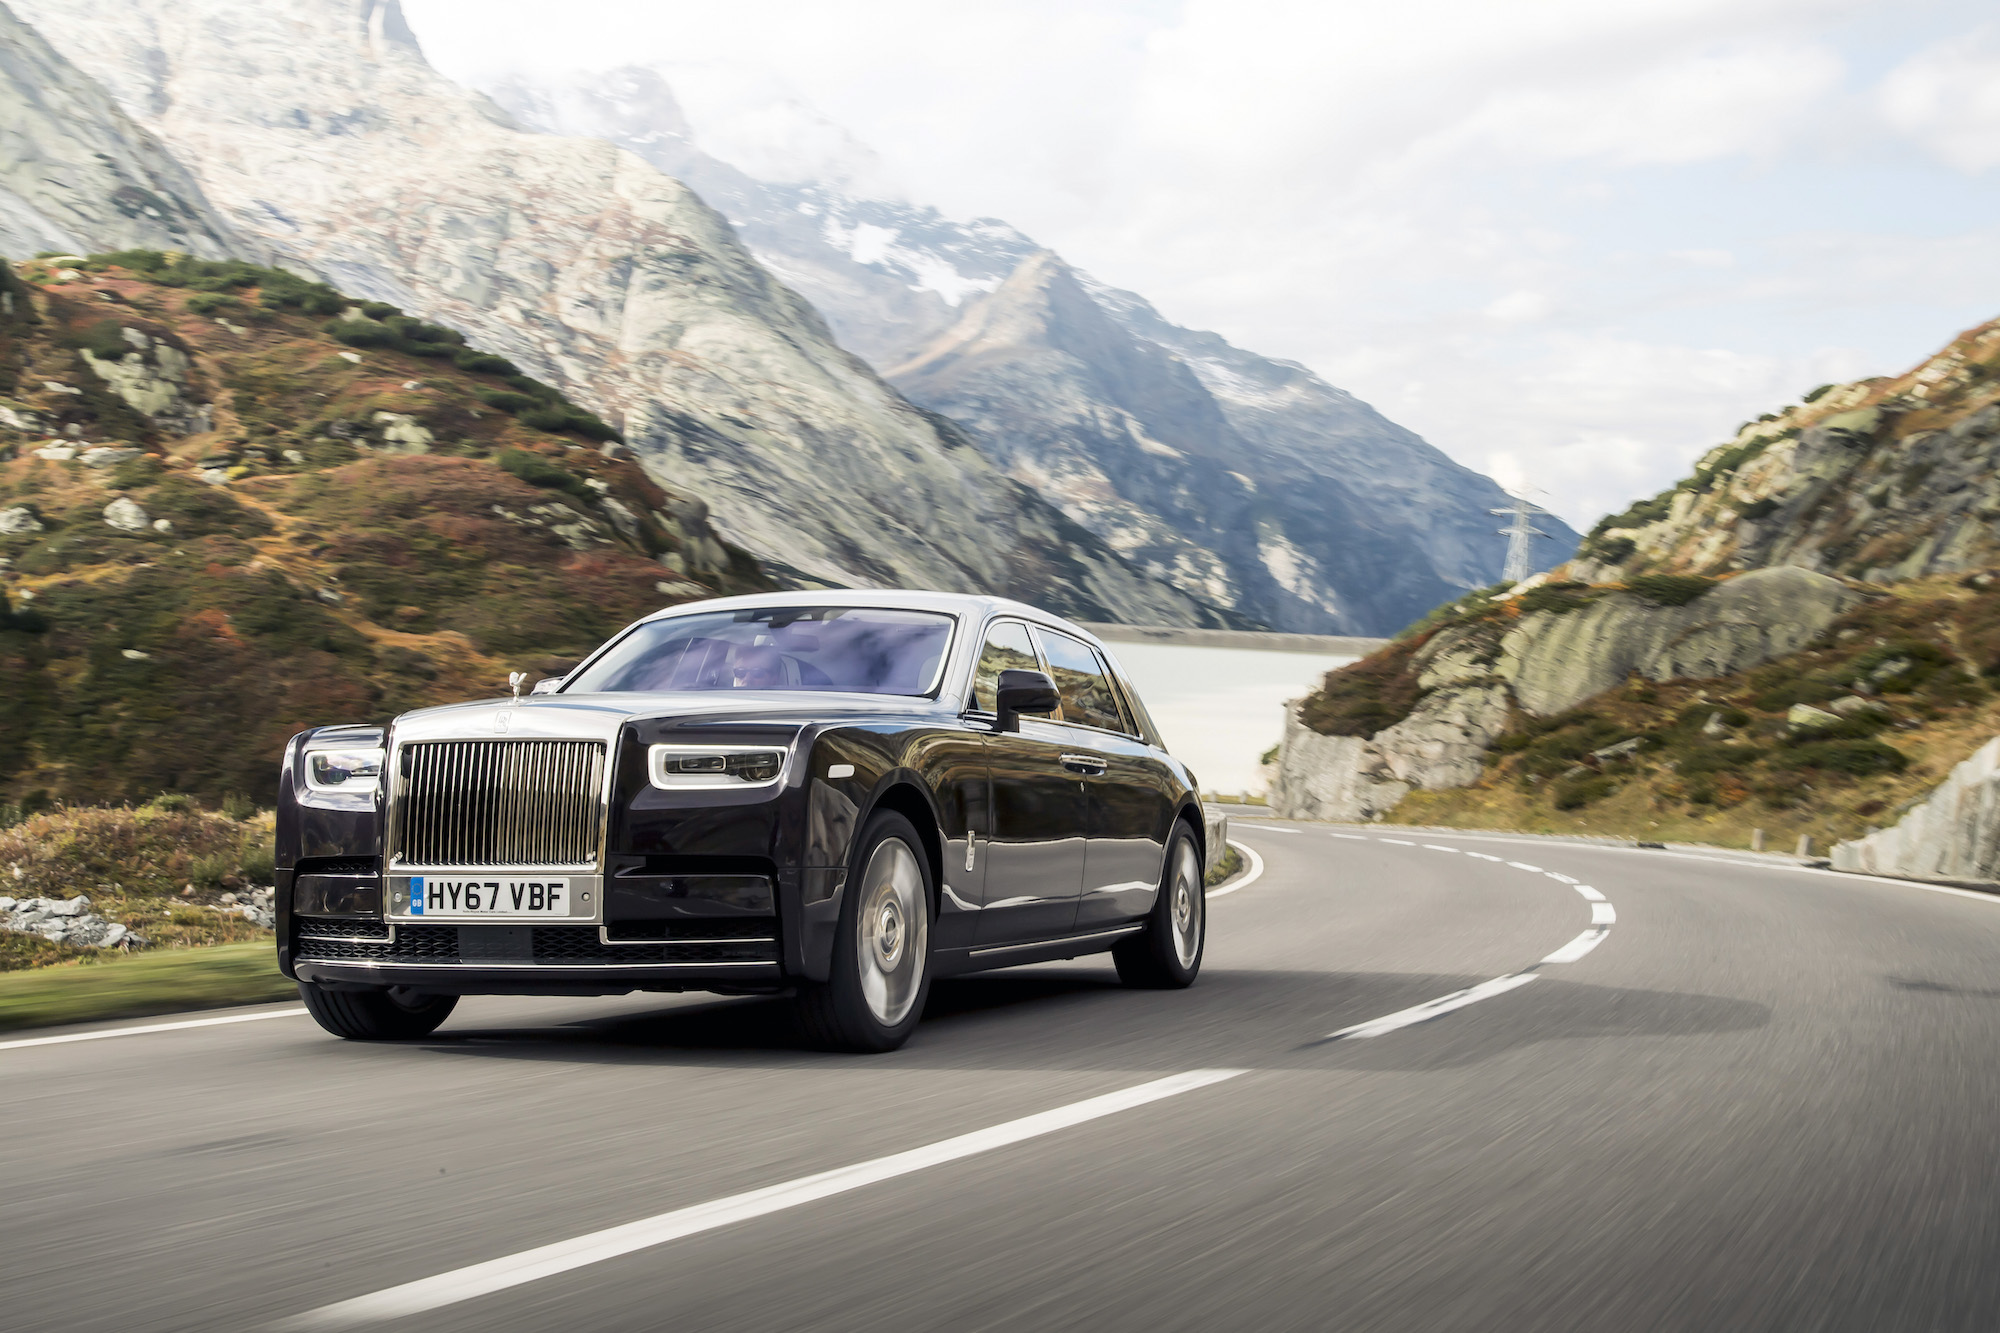 First Look: 2018 Rolls-Royce Phantom VIII